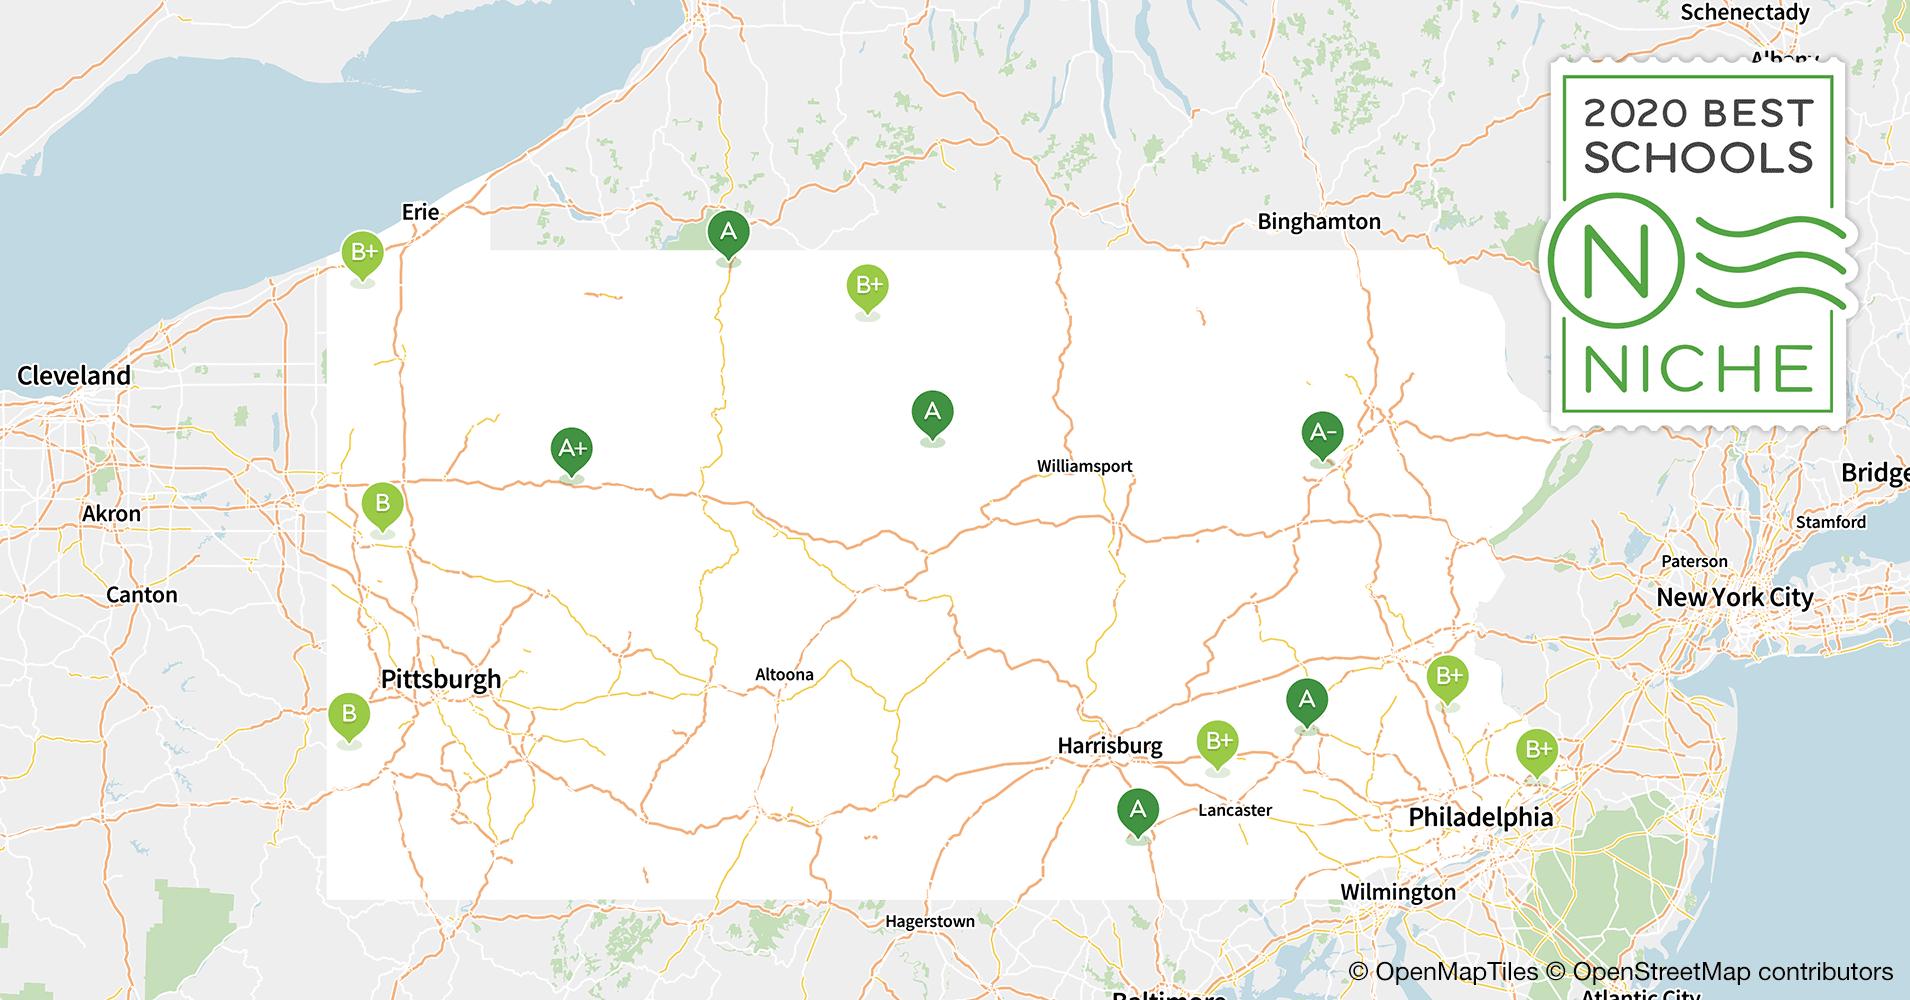 Best Pa Schools >> 2020 Best School Districts In Pennsylvania Niche